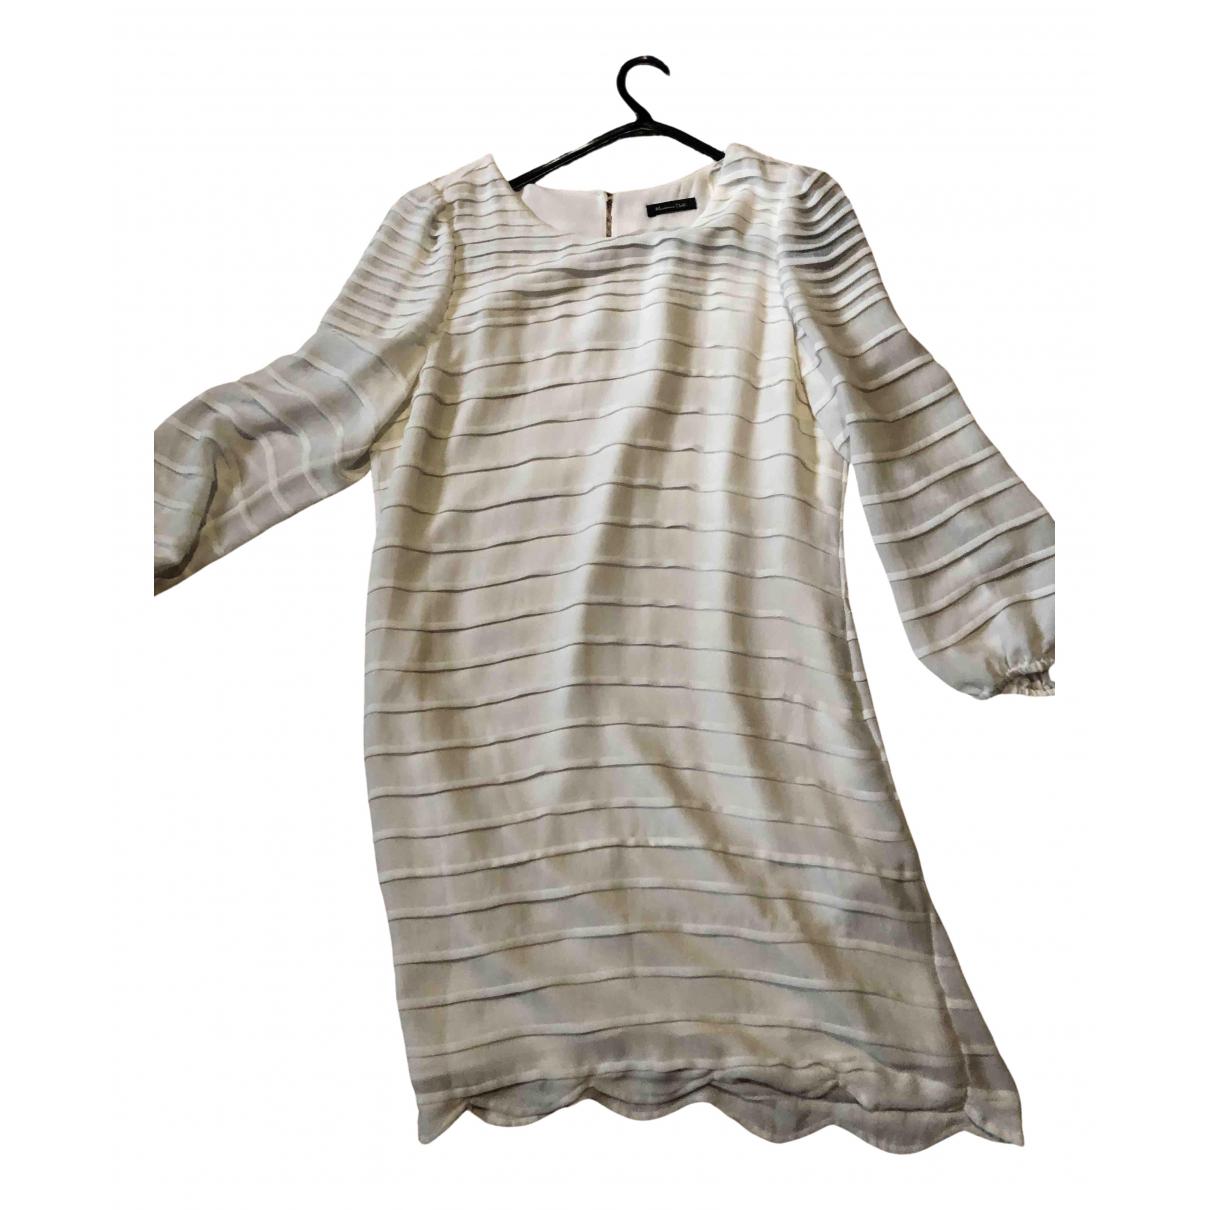 Massimo Dutti \N Kleid in  Ecru Polyester